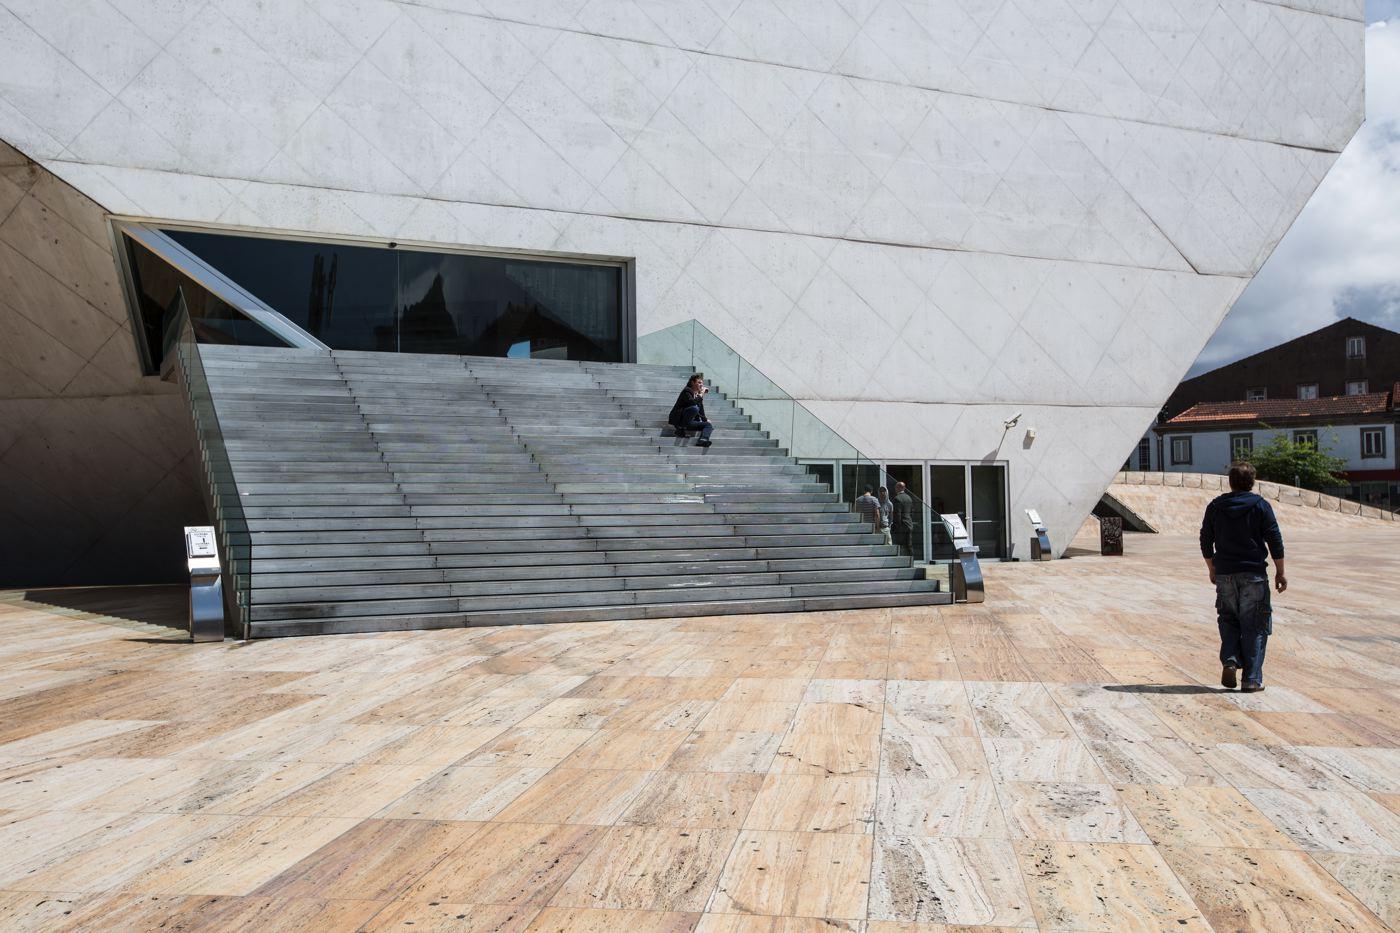 LDKphoto_PORTO-Casa da Musica-008.jpg